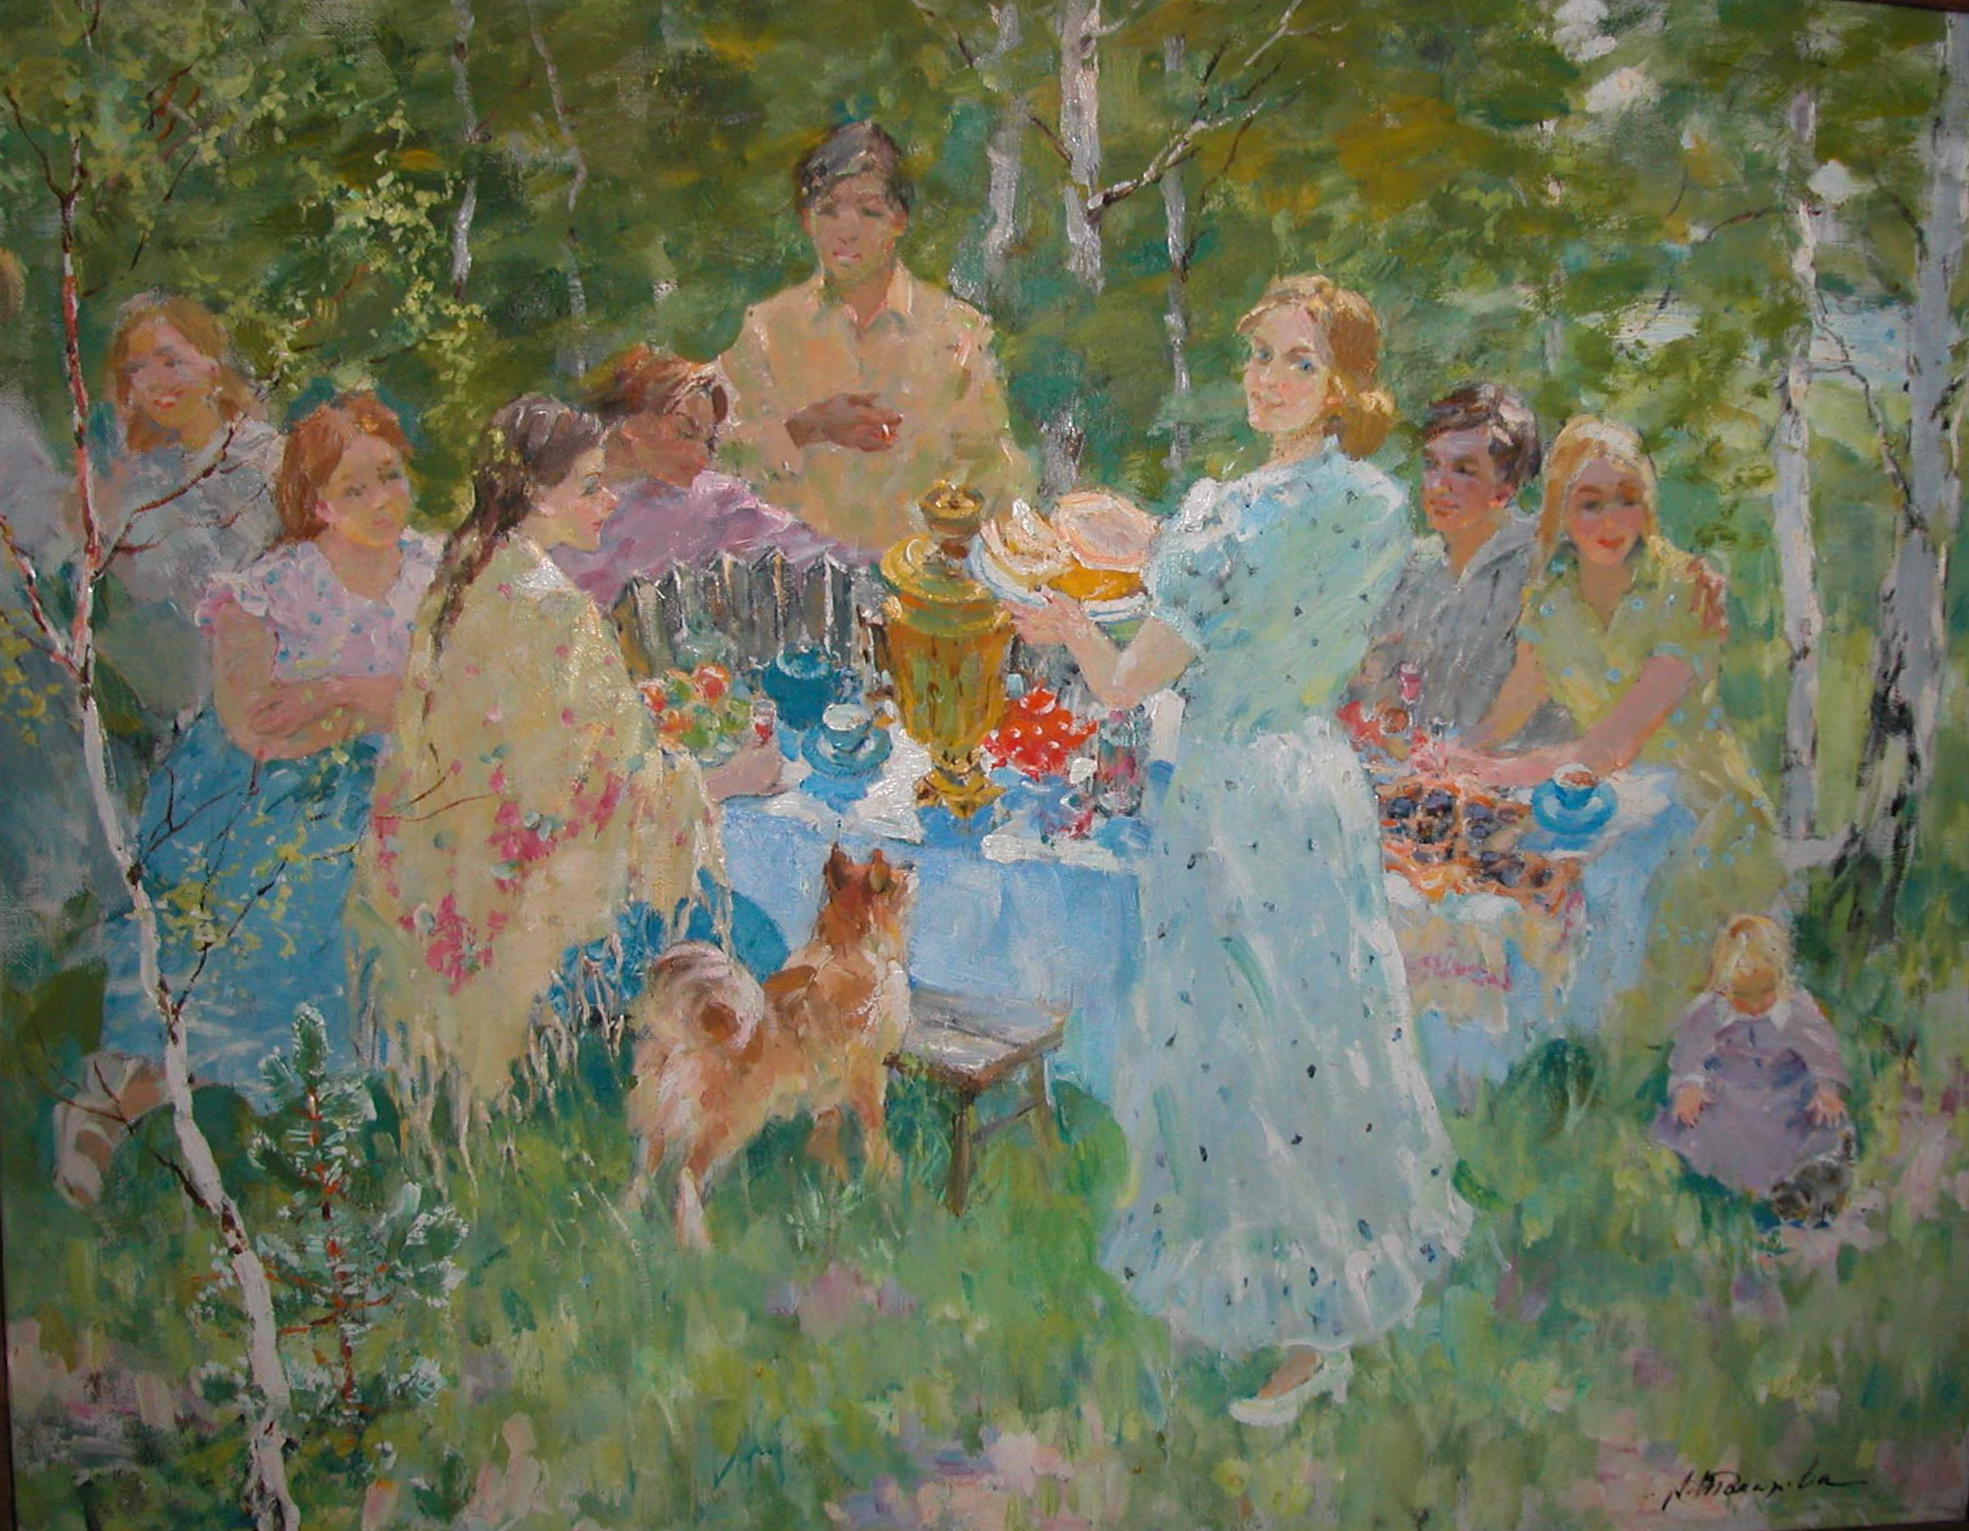 """Tea party with samovar"", оil on canvas, signed, size: 100 x 80 cm. Чаепитие с самоваром, холст, масло, размер: 100 х 80 см., подпись."